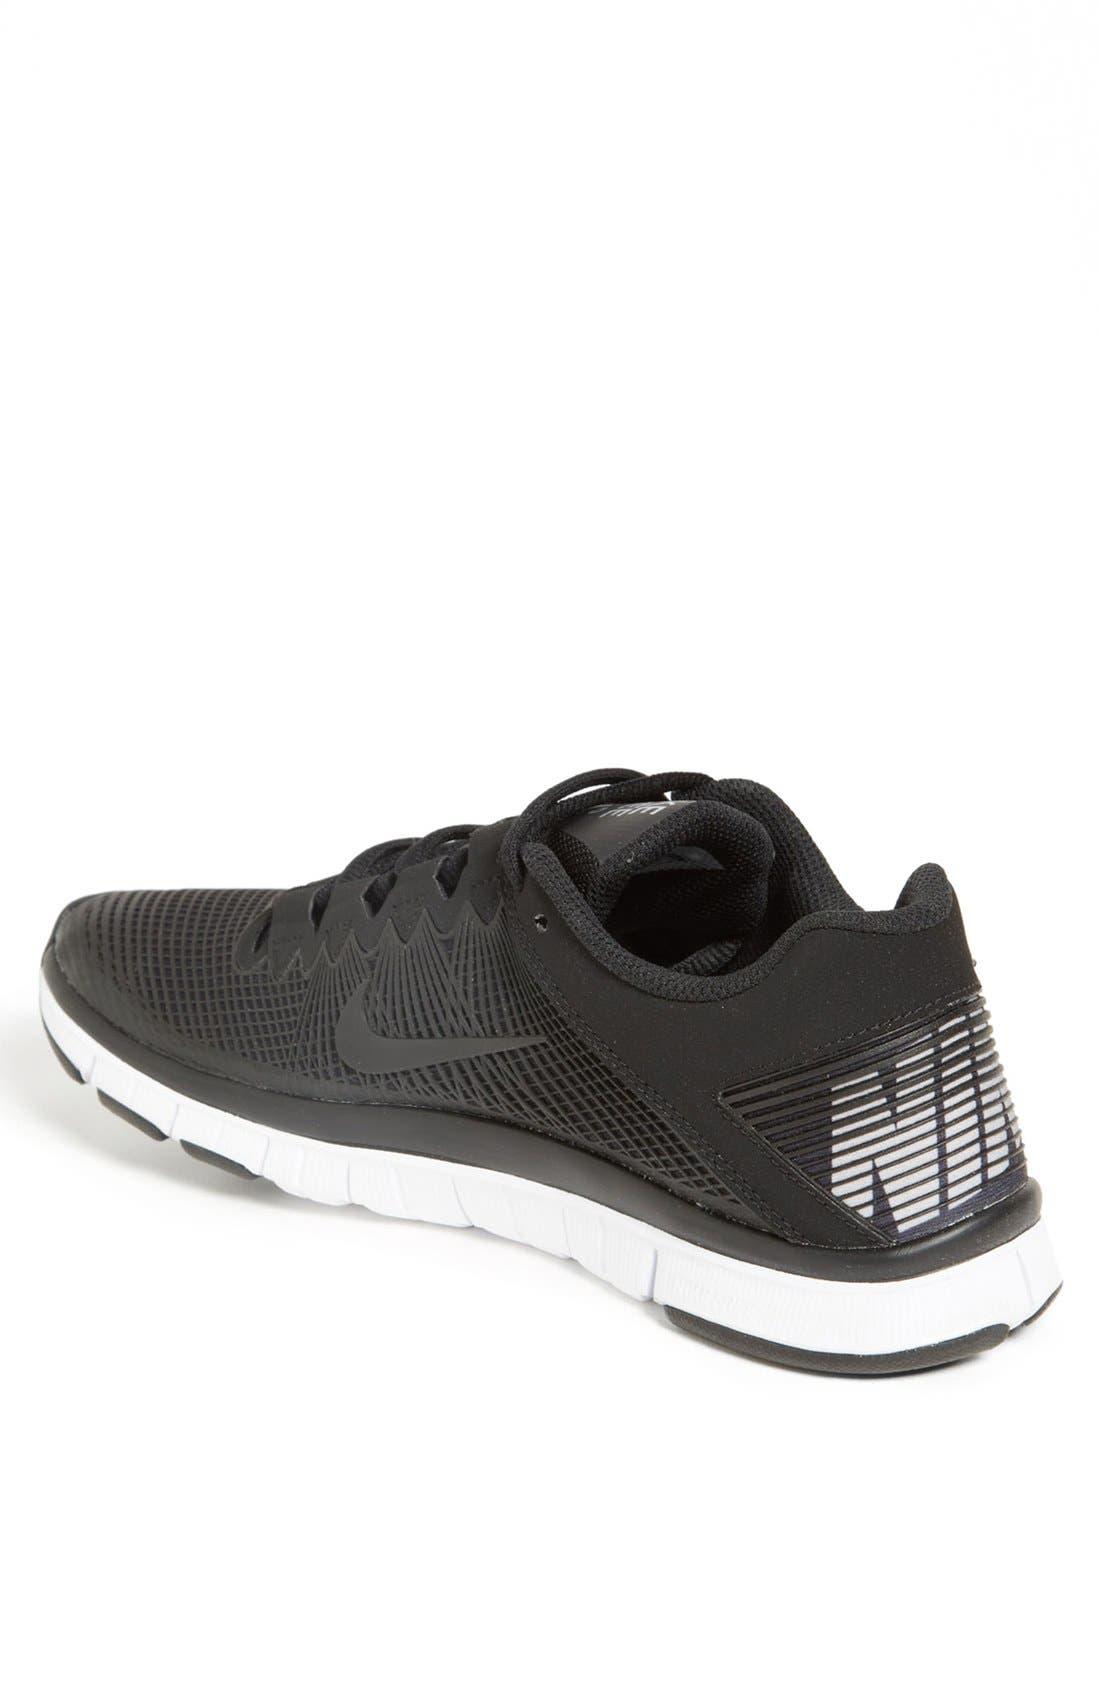 Alternate Image 2  - Nike 'Free Trainer 3.0' Training Shoe (Men)